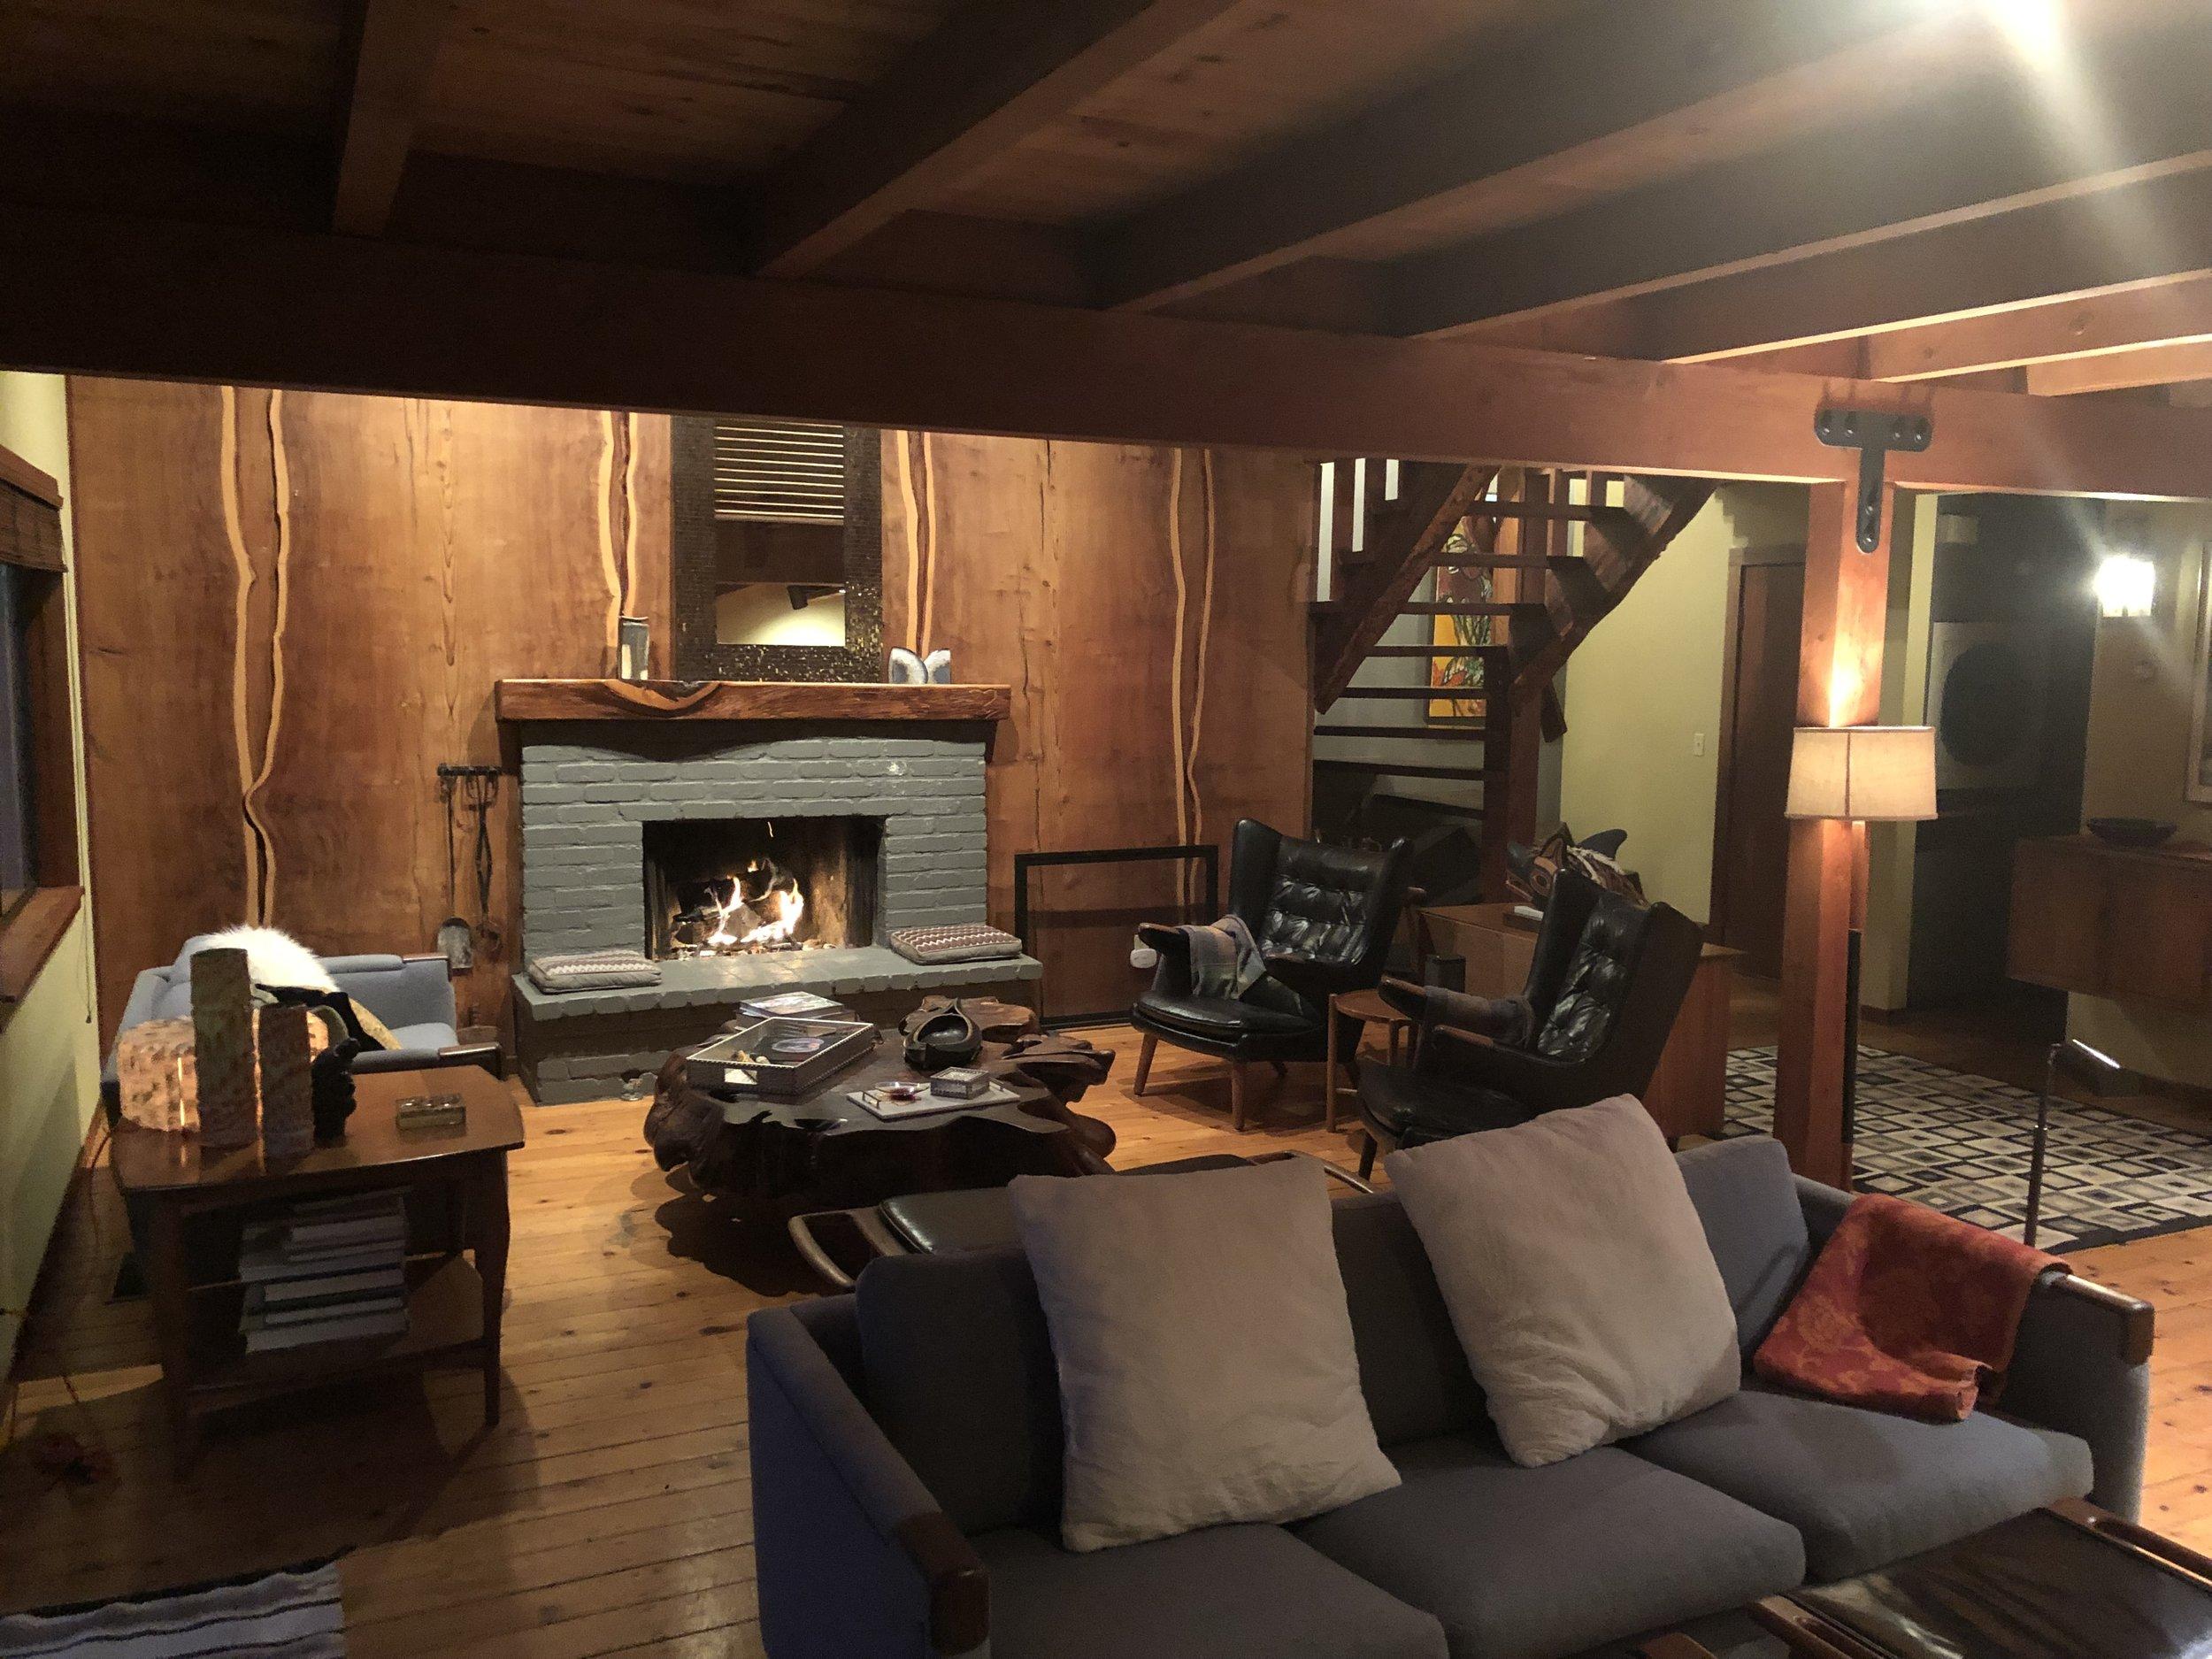 Our_Caramel_home.jpg